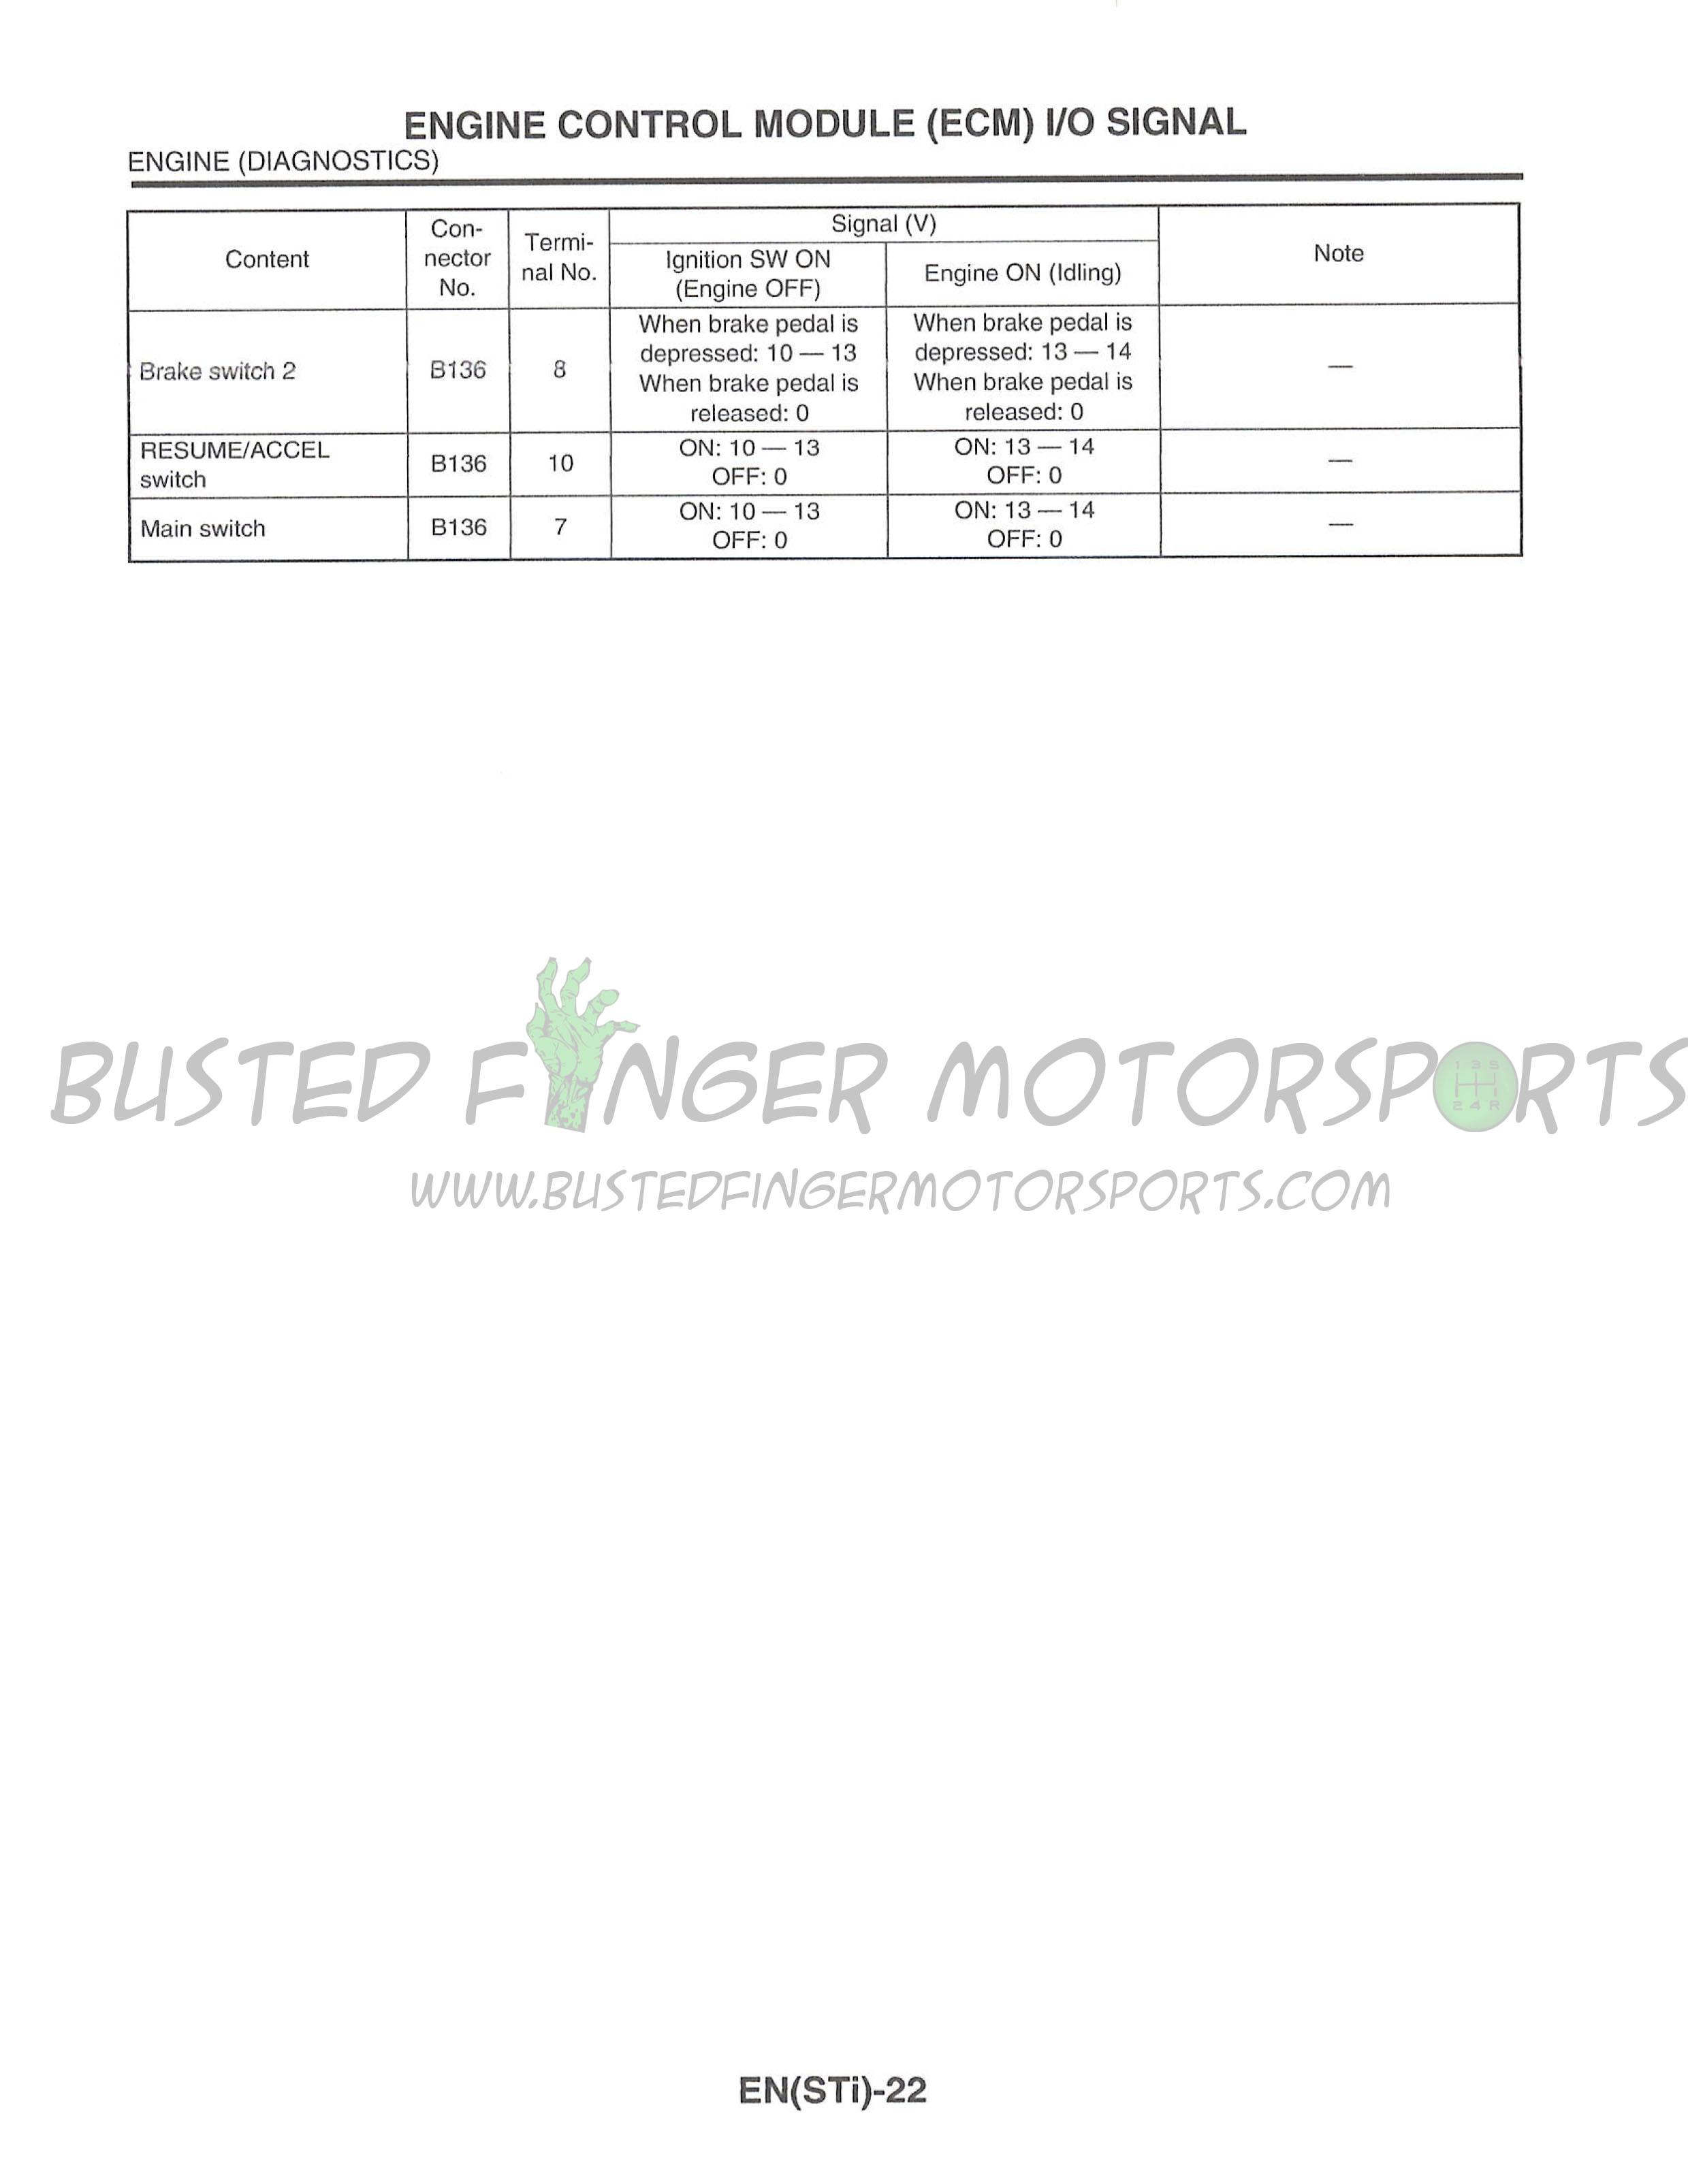 Phenomenal Busted Finger Motorsports 2004 2005 Sti Ecu Pinout Sheets Wiring Cloud Hisonuggs Outletorg